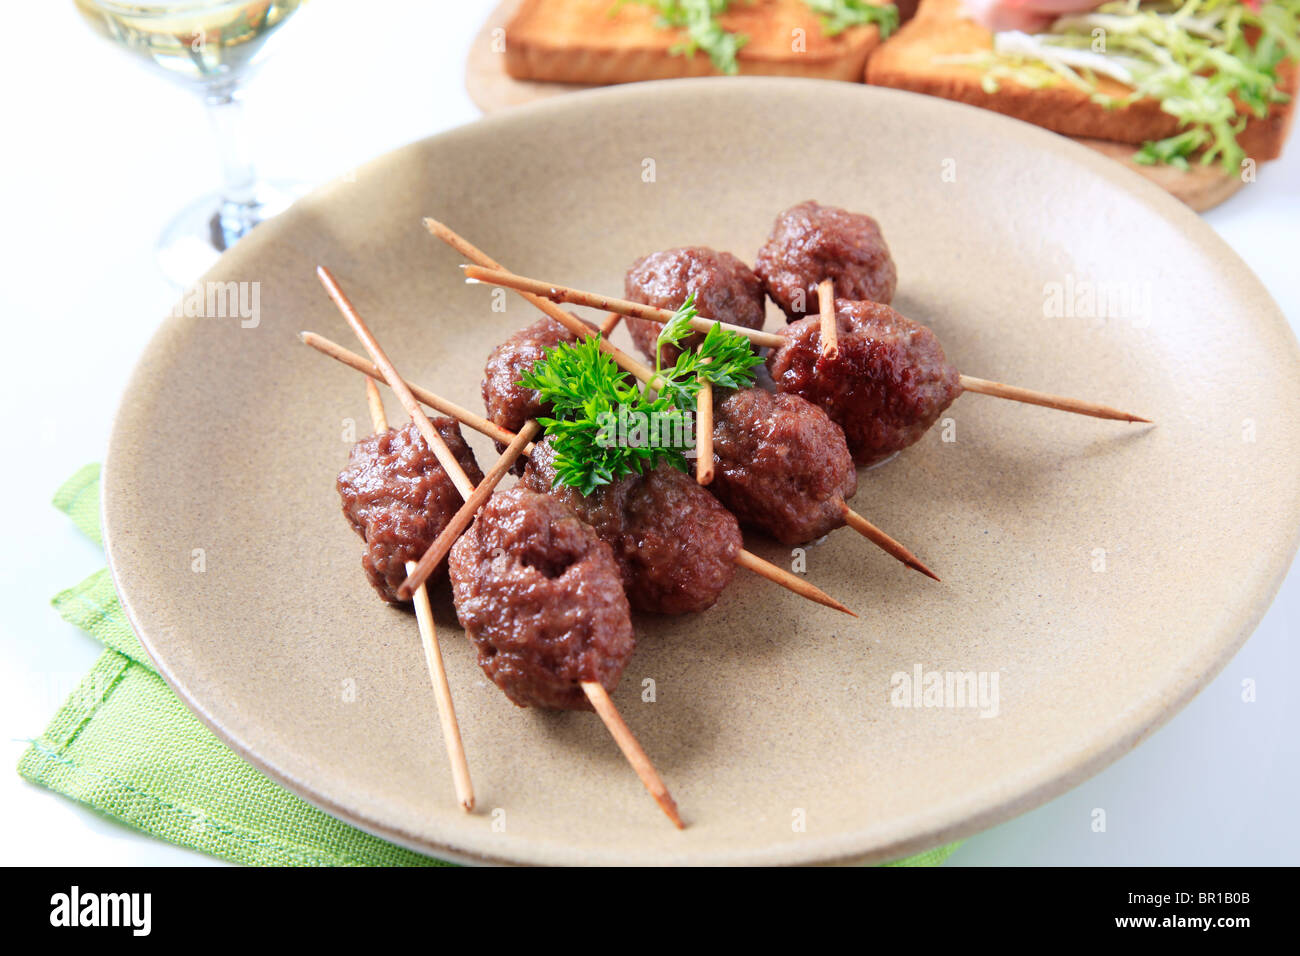 Roast minced meat balls - Stock Image